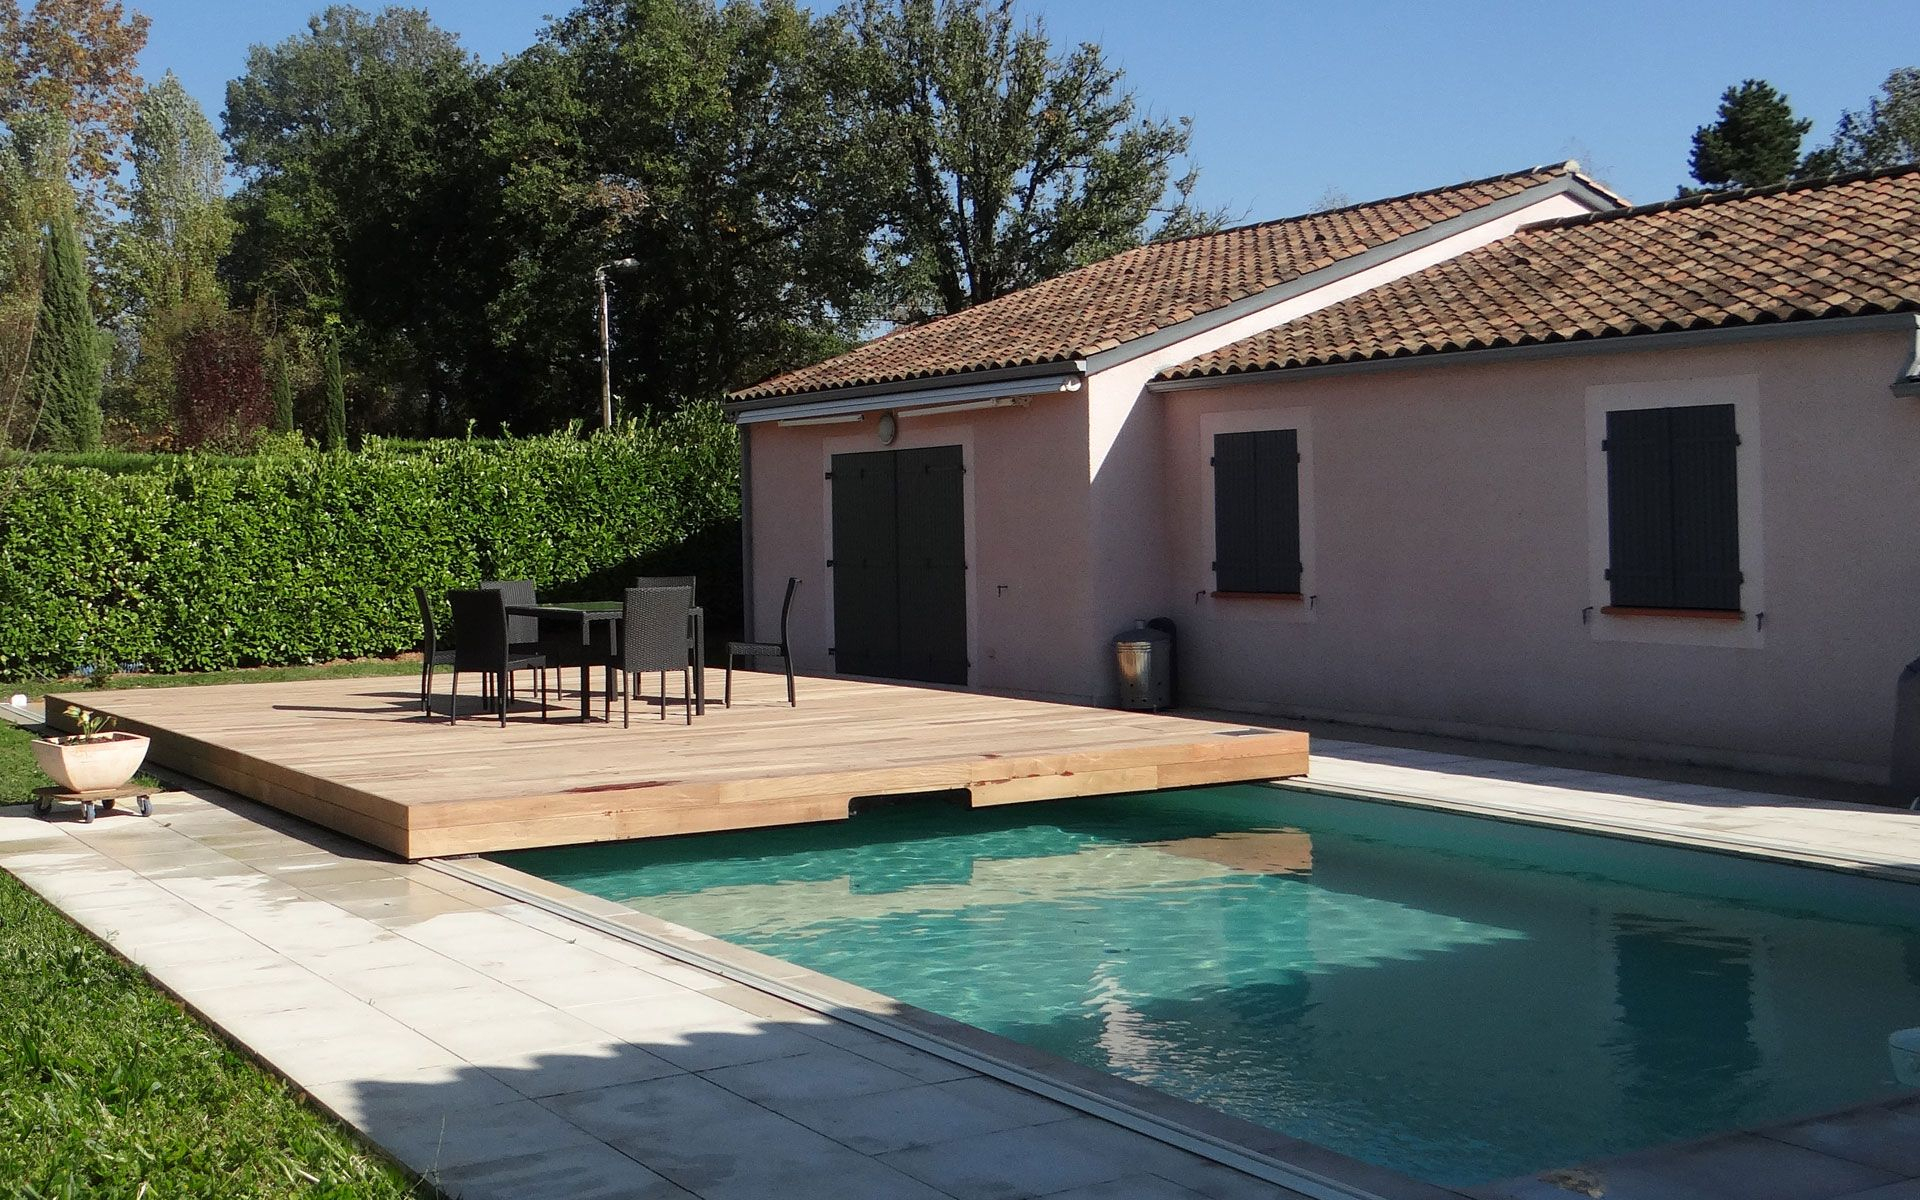 Couverture #piscine #coulissant Terrasse Coulissante Pour ... serapportantà Abri Terrasse Coulissant